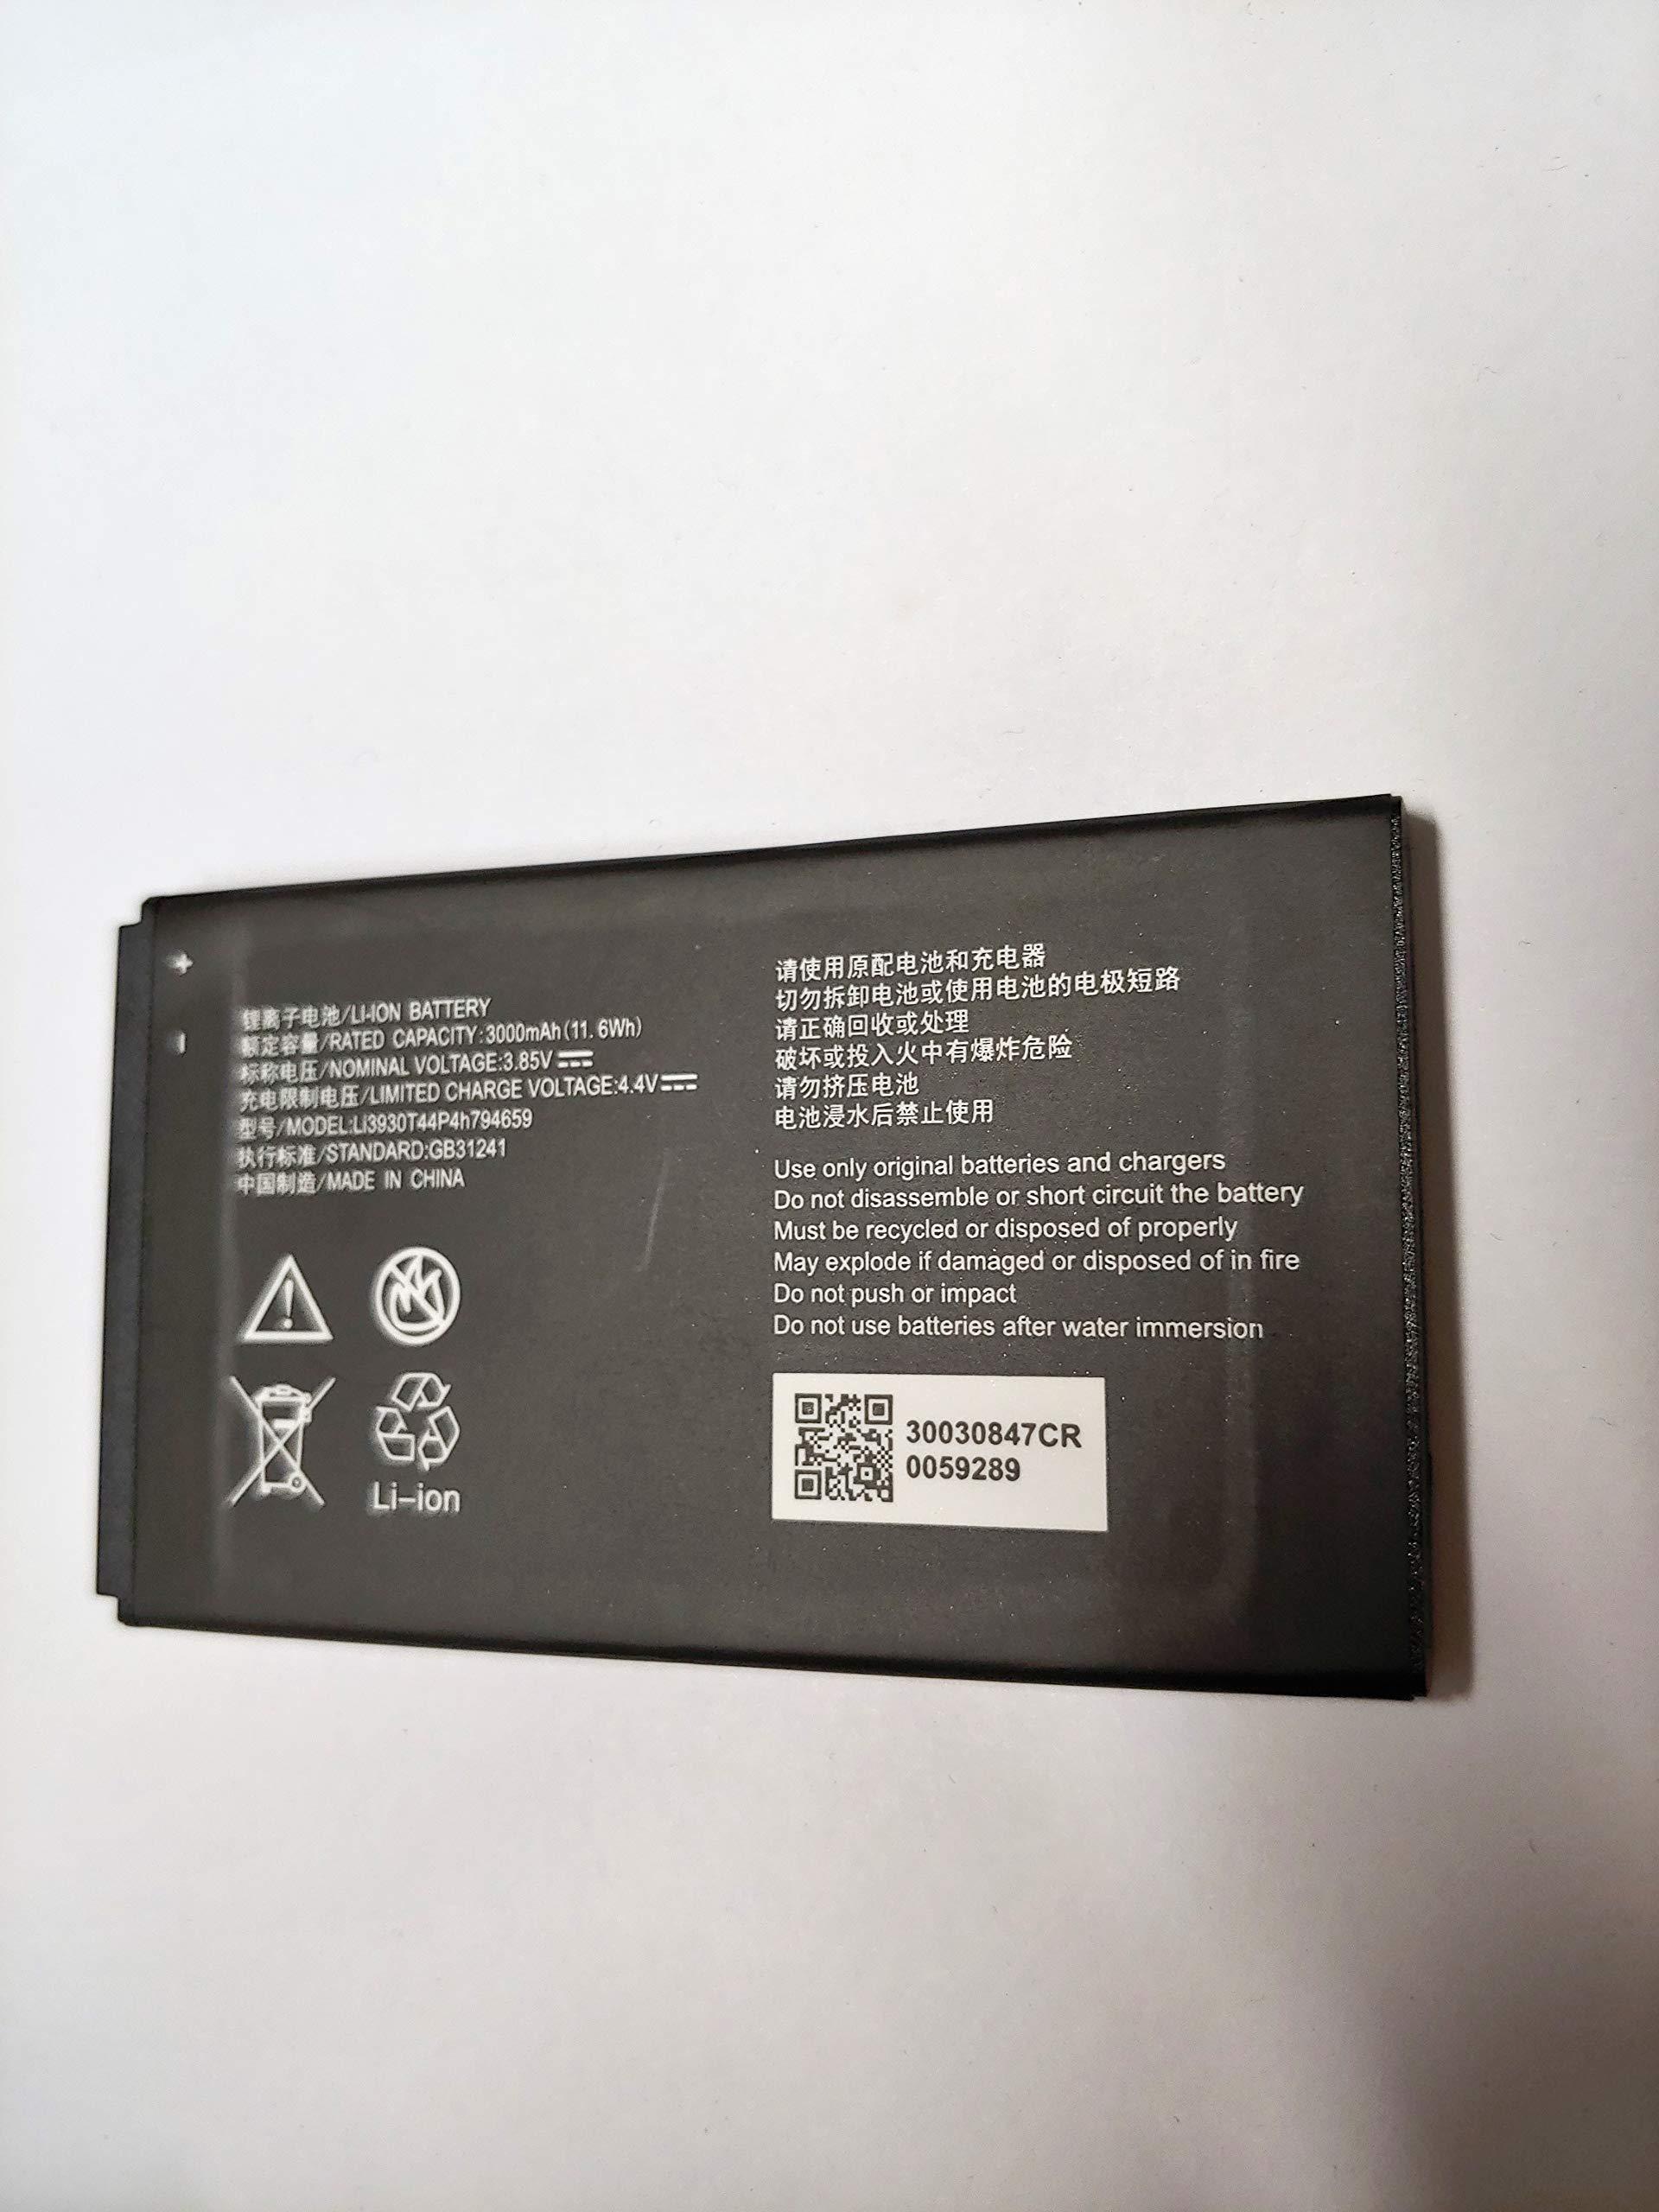 Original A&B Standard Battery for ZTE MF985 AT&T Velocity 2 Hotspot Li3930T44P4h794659 3000mAh by A&B